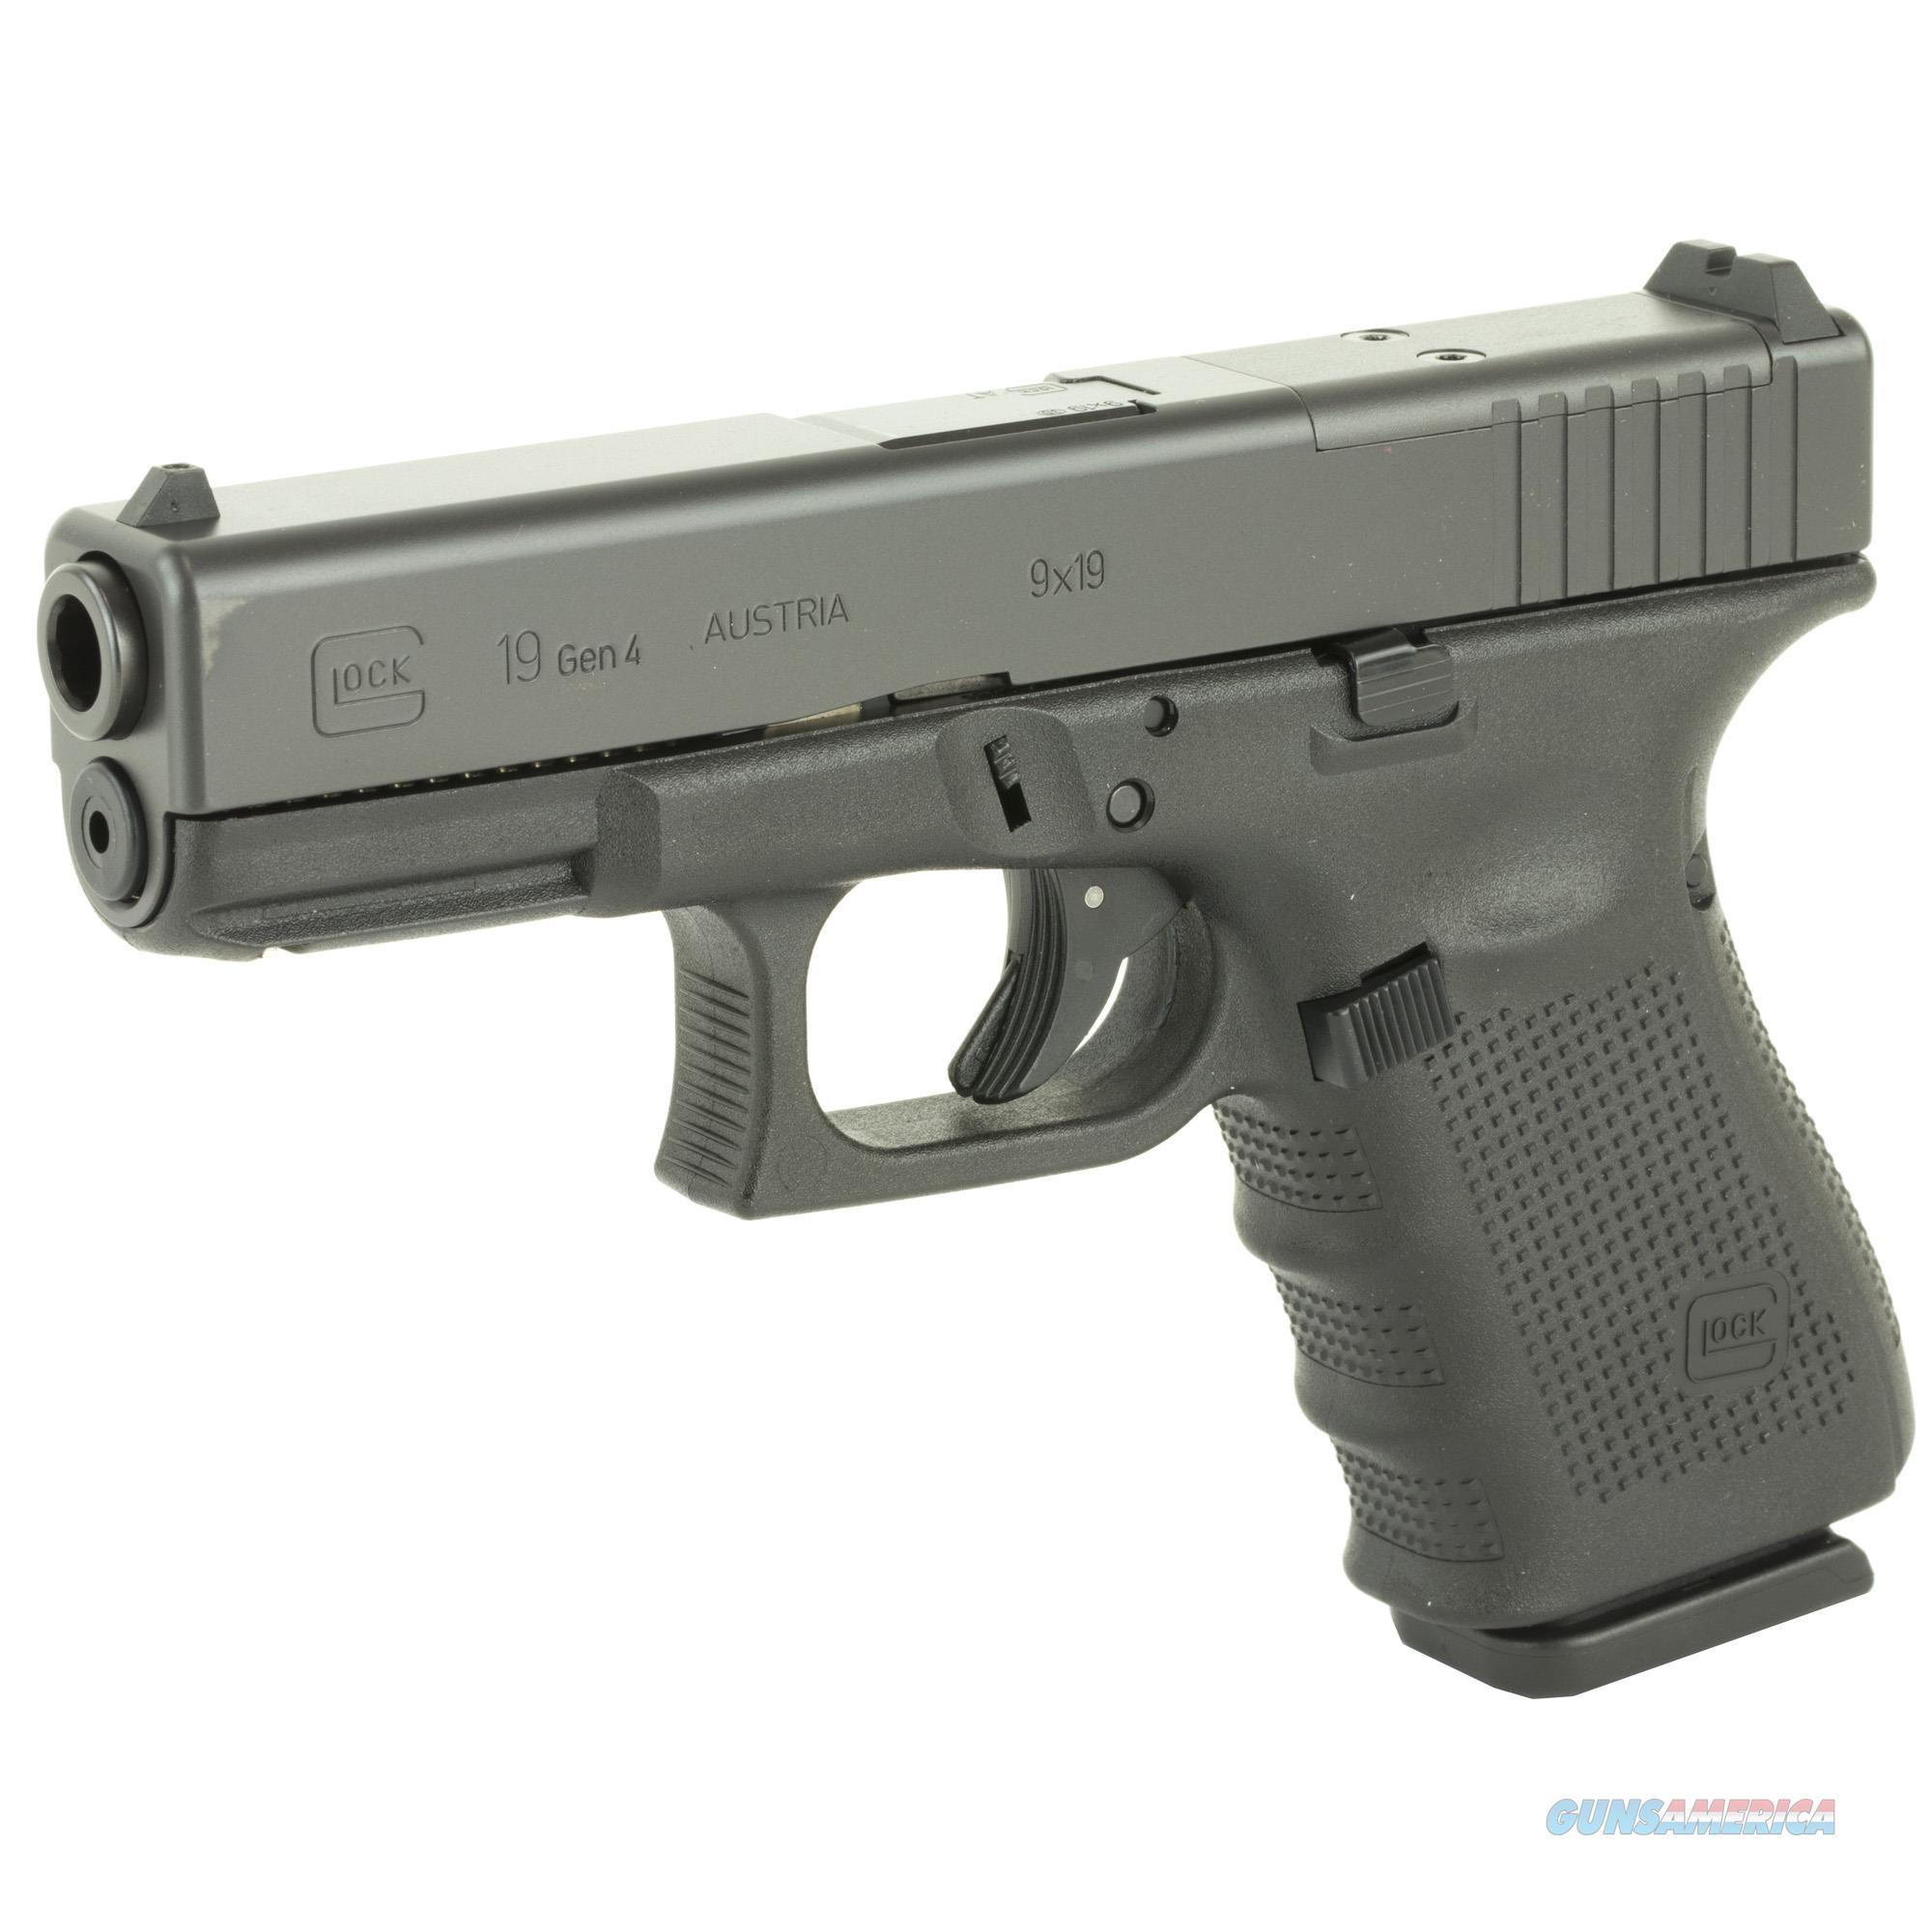 Glock 19 Gen4 9mm MOS ready w/3 Mags!  Guns > Pistols > Glock Pistols > 19/19X